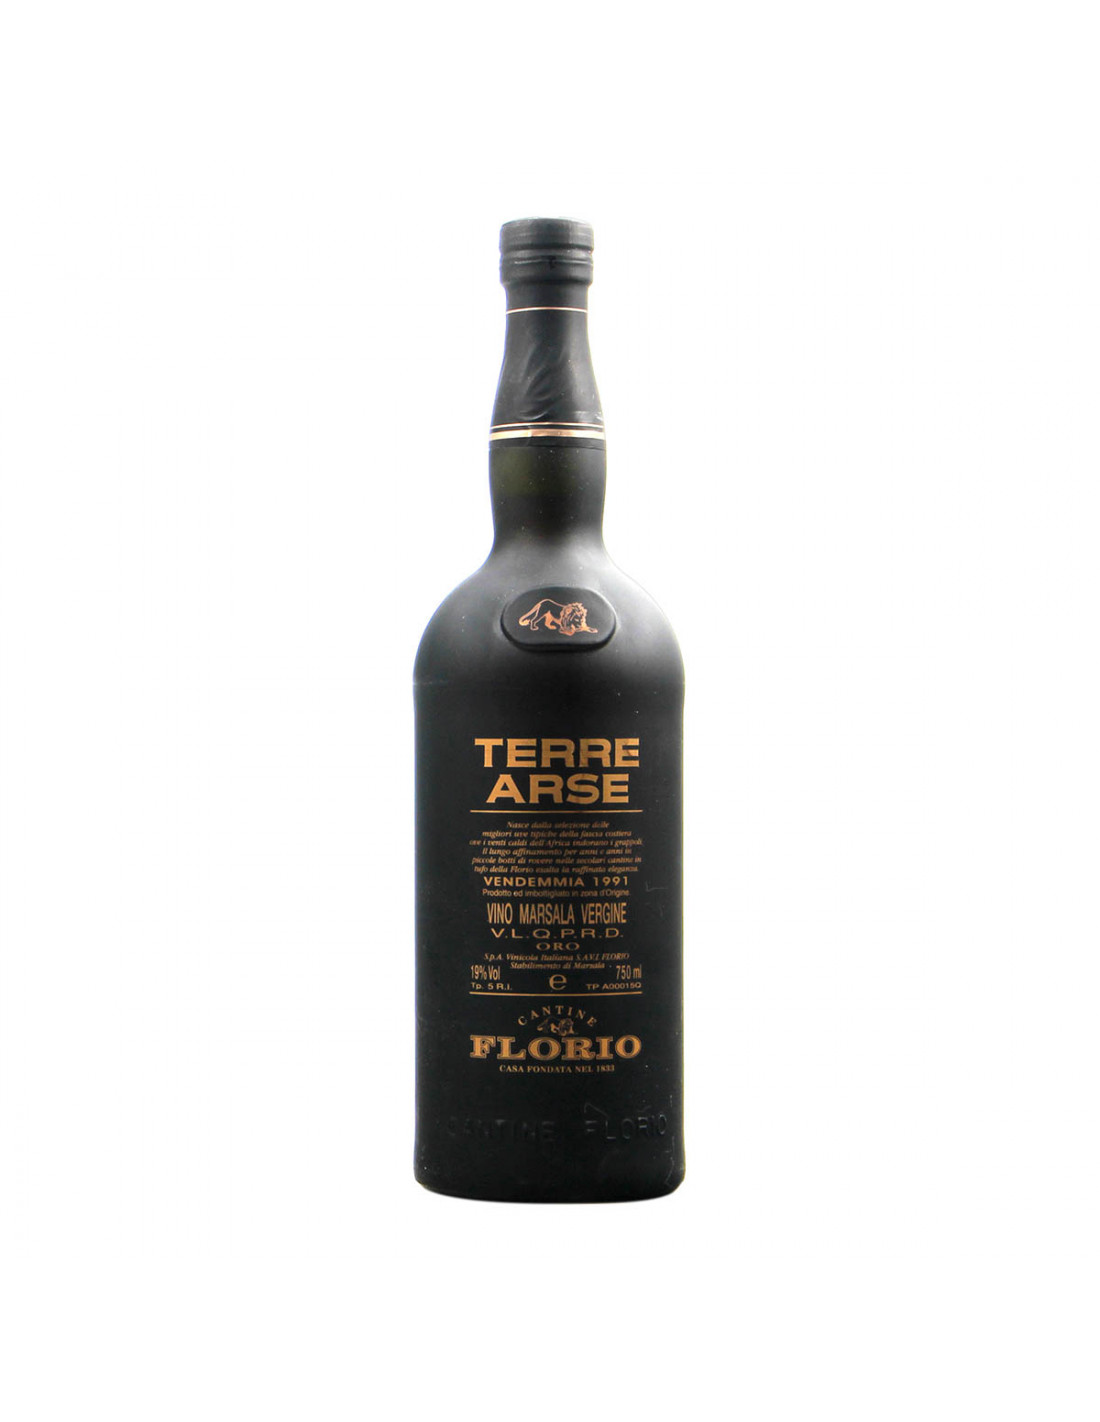 Florio Marsala Vergine Terre Arse 1991 Grandi Bottiglie